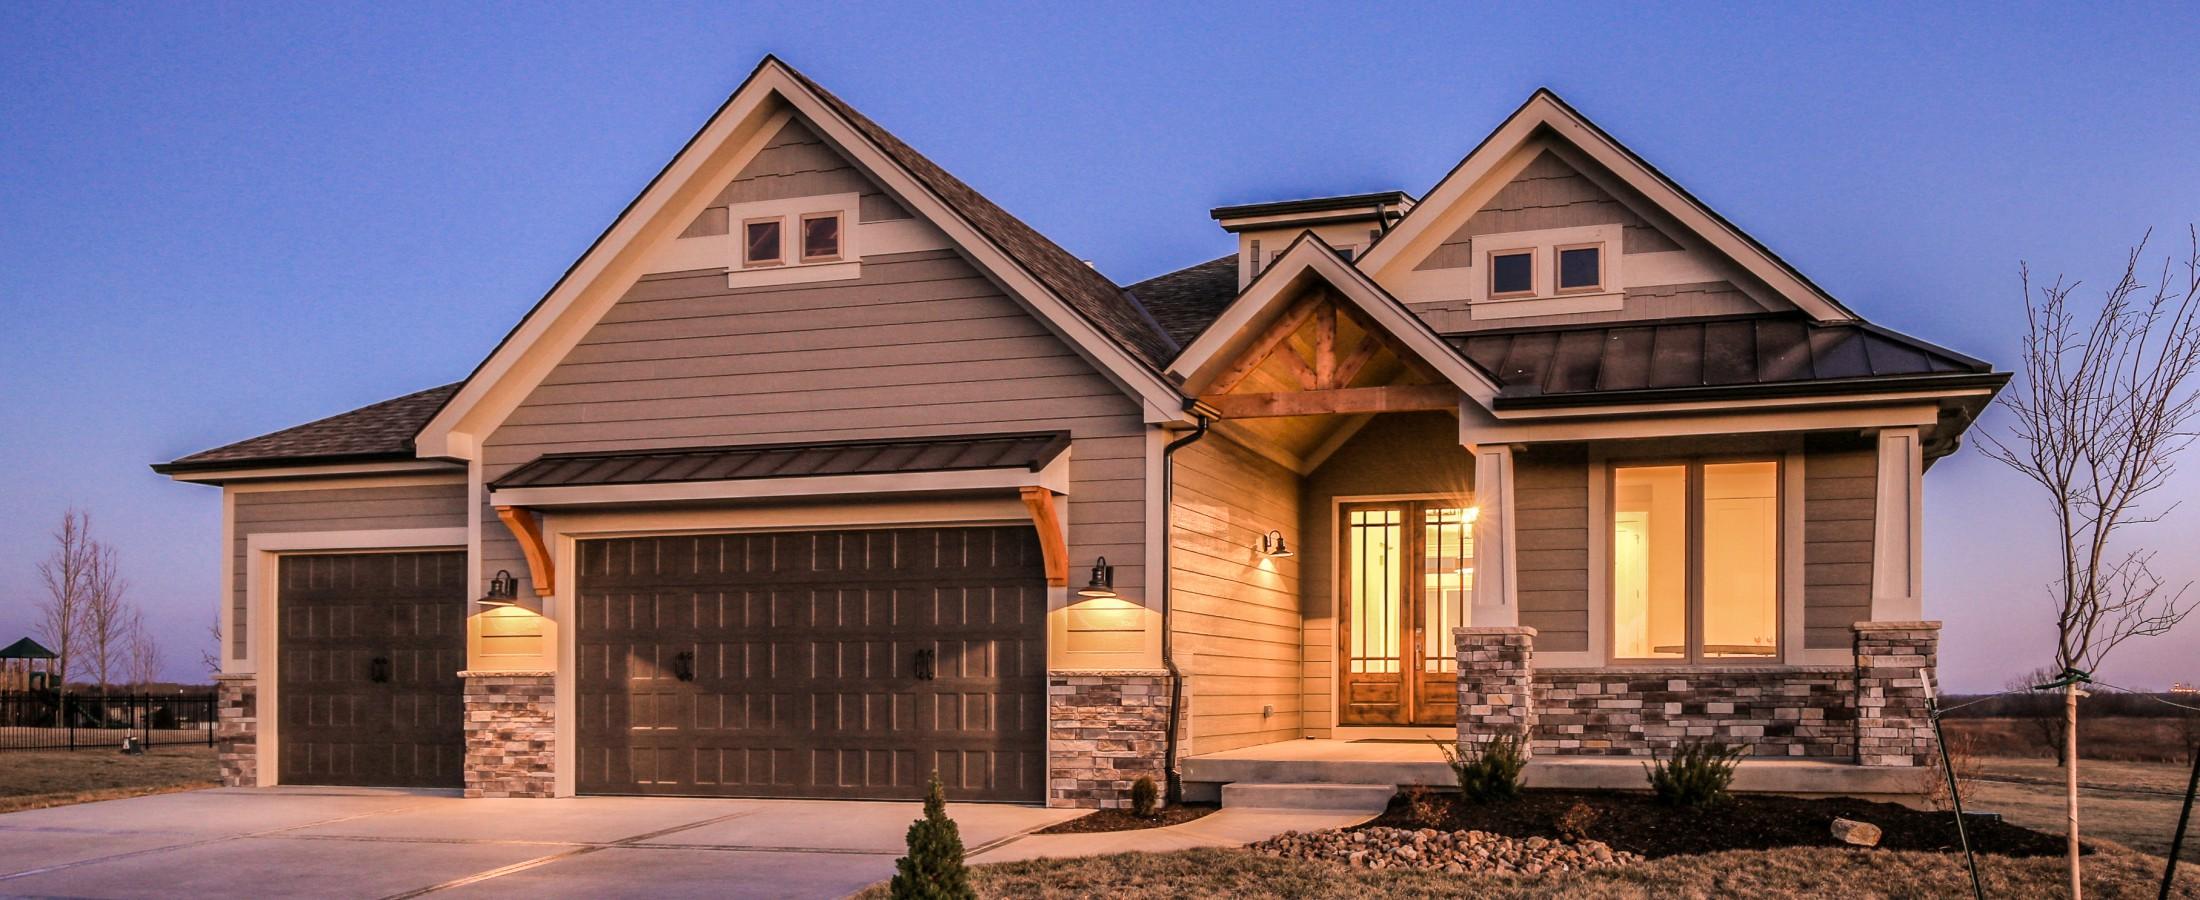 Whitetail Run Real Estate Whitetail Run Homes For Sale